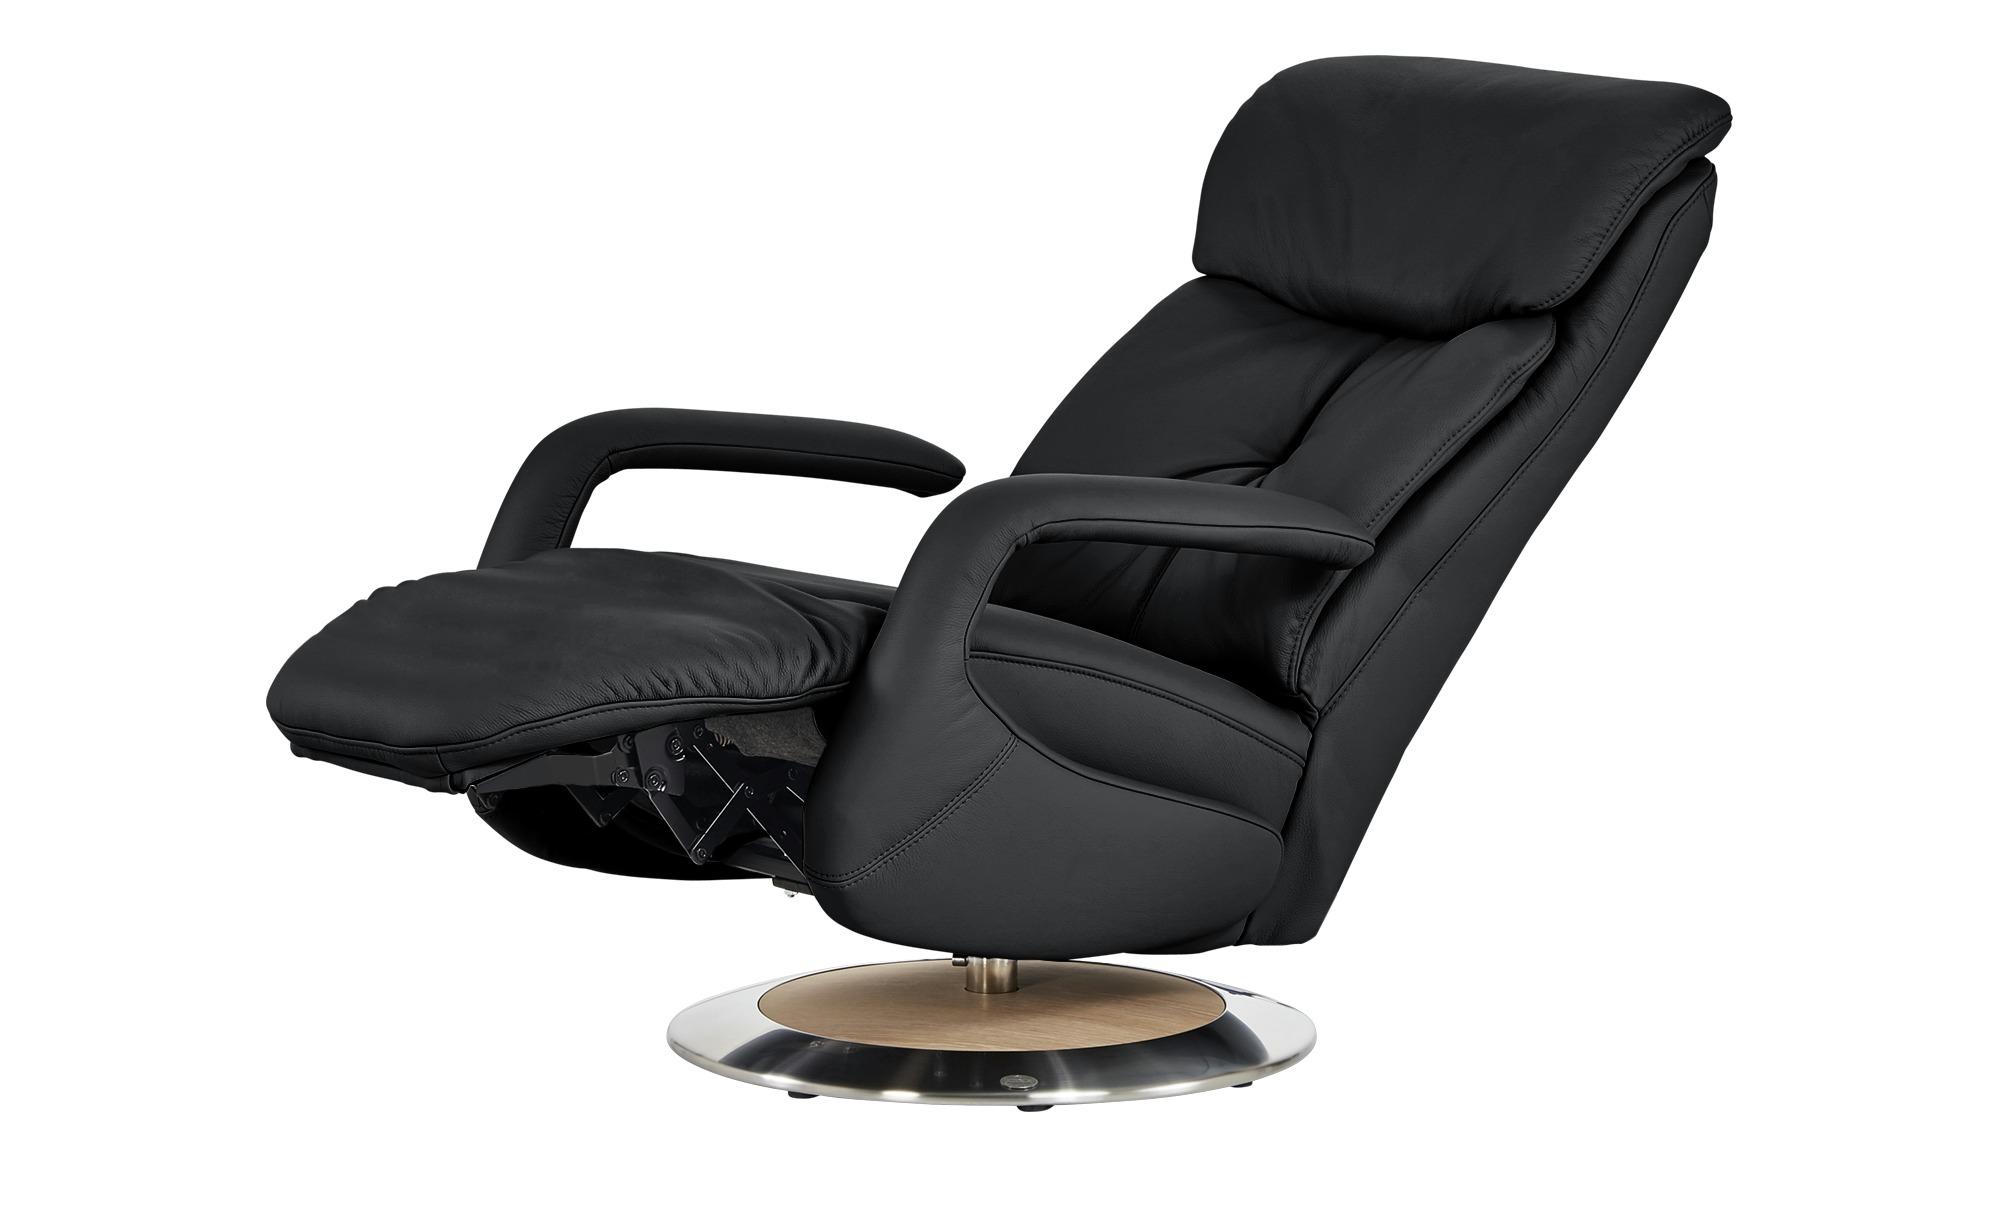 Relaxsessel schwarz - Leder Alea ¦ schwarz ¦ Maße (cm): B: 70 H: 111 T: 88 Polstermöbel > Sessel > Fernsehsessel - Höffner